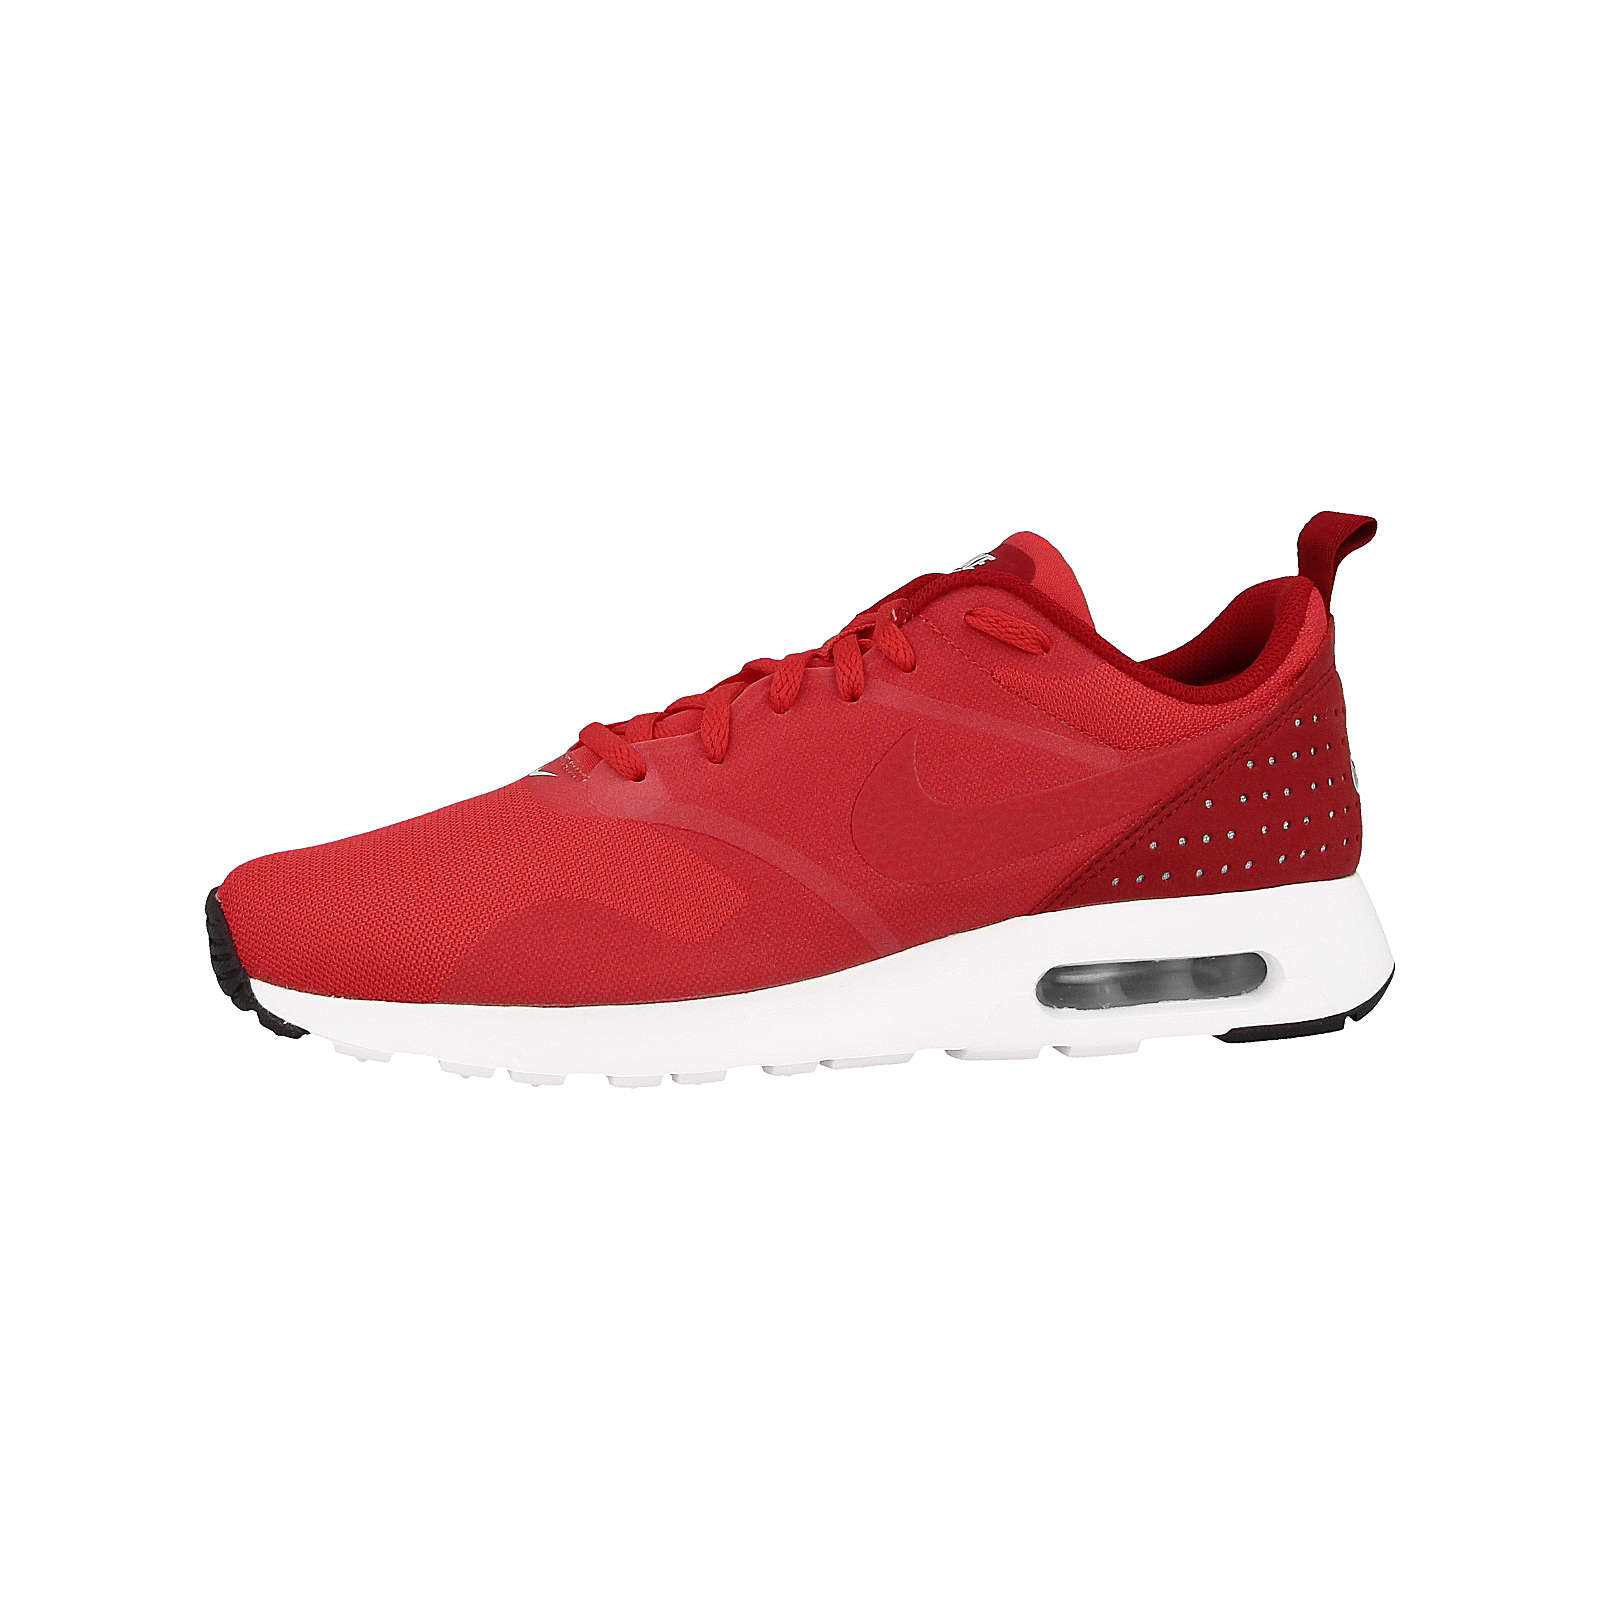 Nike Sportswear Sneakers Low Air Max Tavas rot Herren Gr. 45,5